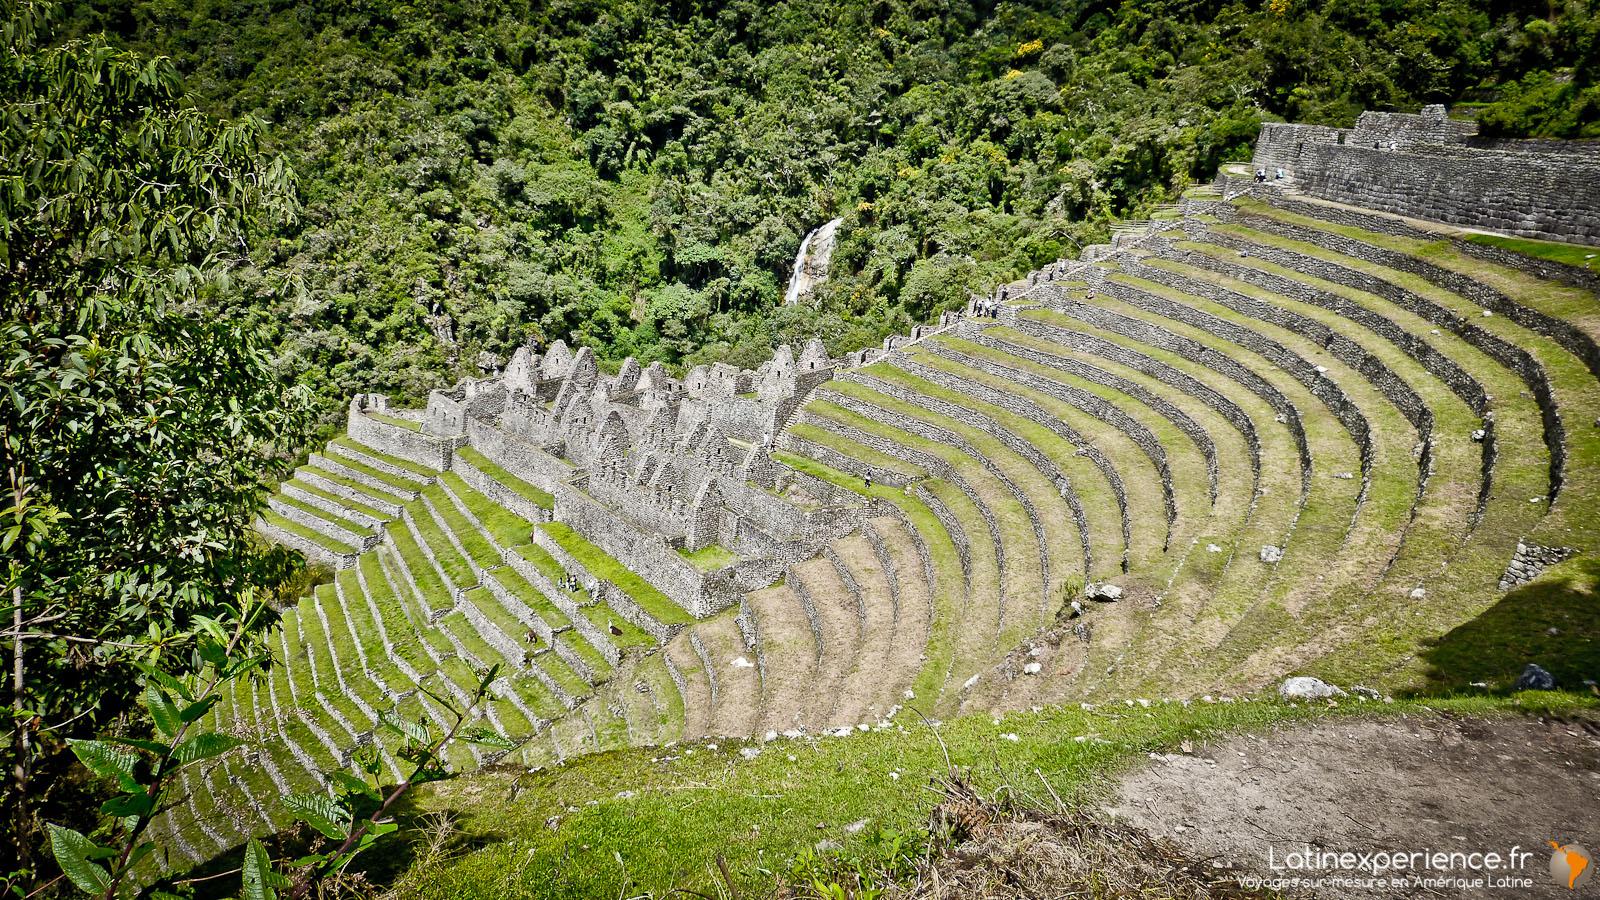 latinexperience voyages - Pérou - Trek - Site de Winaywayna